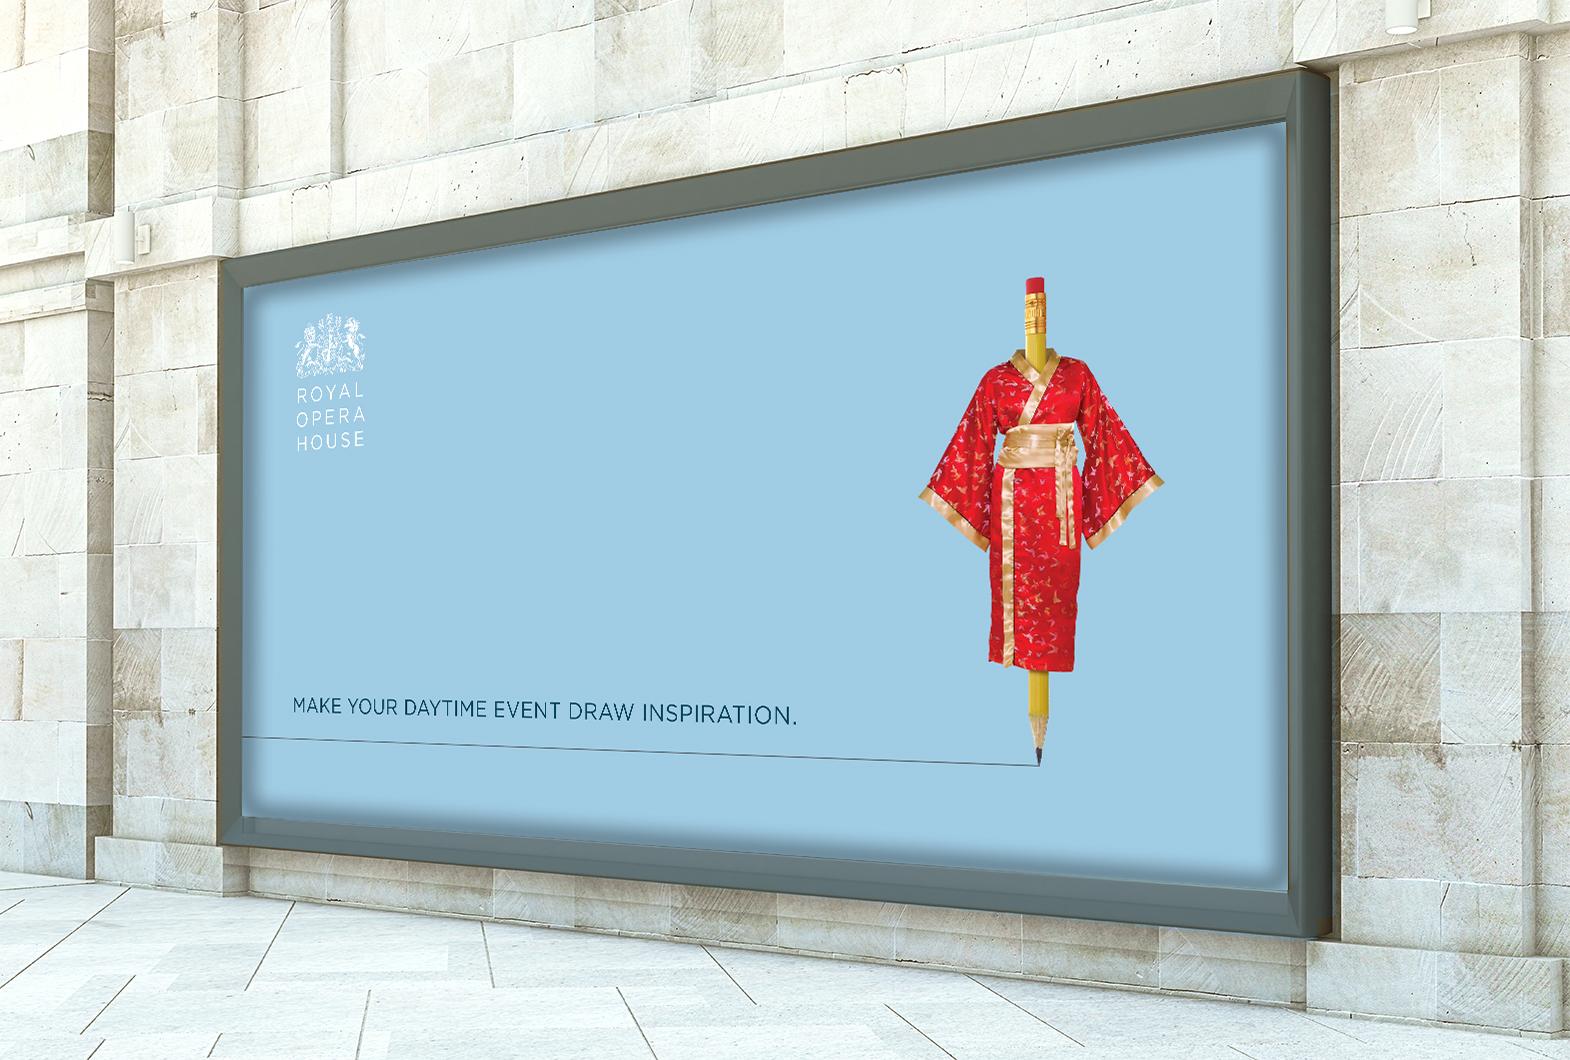 Royal Opera House OOH advertising